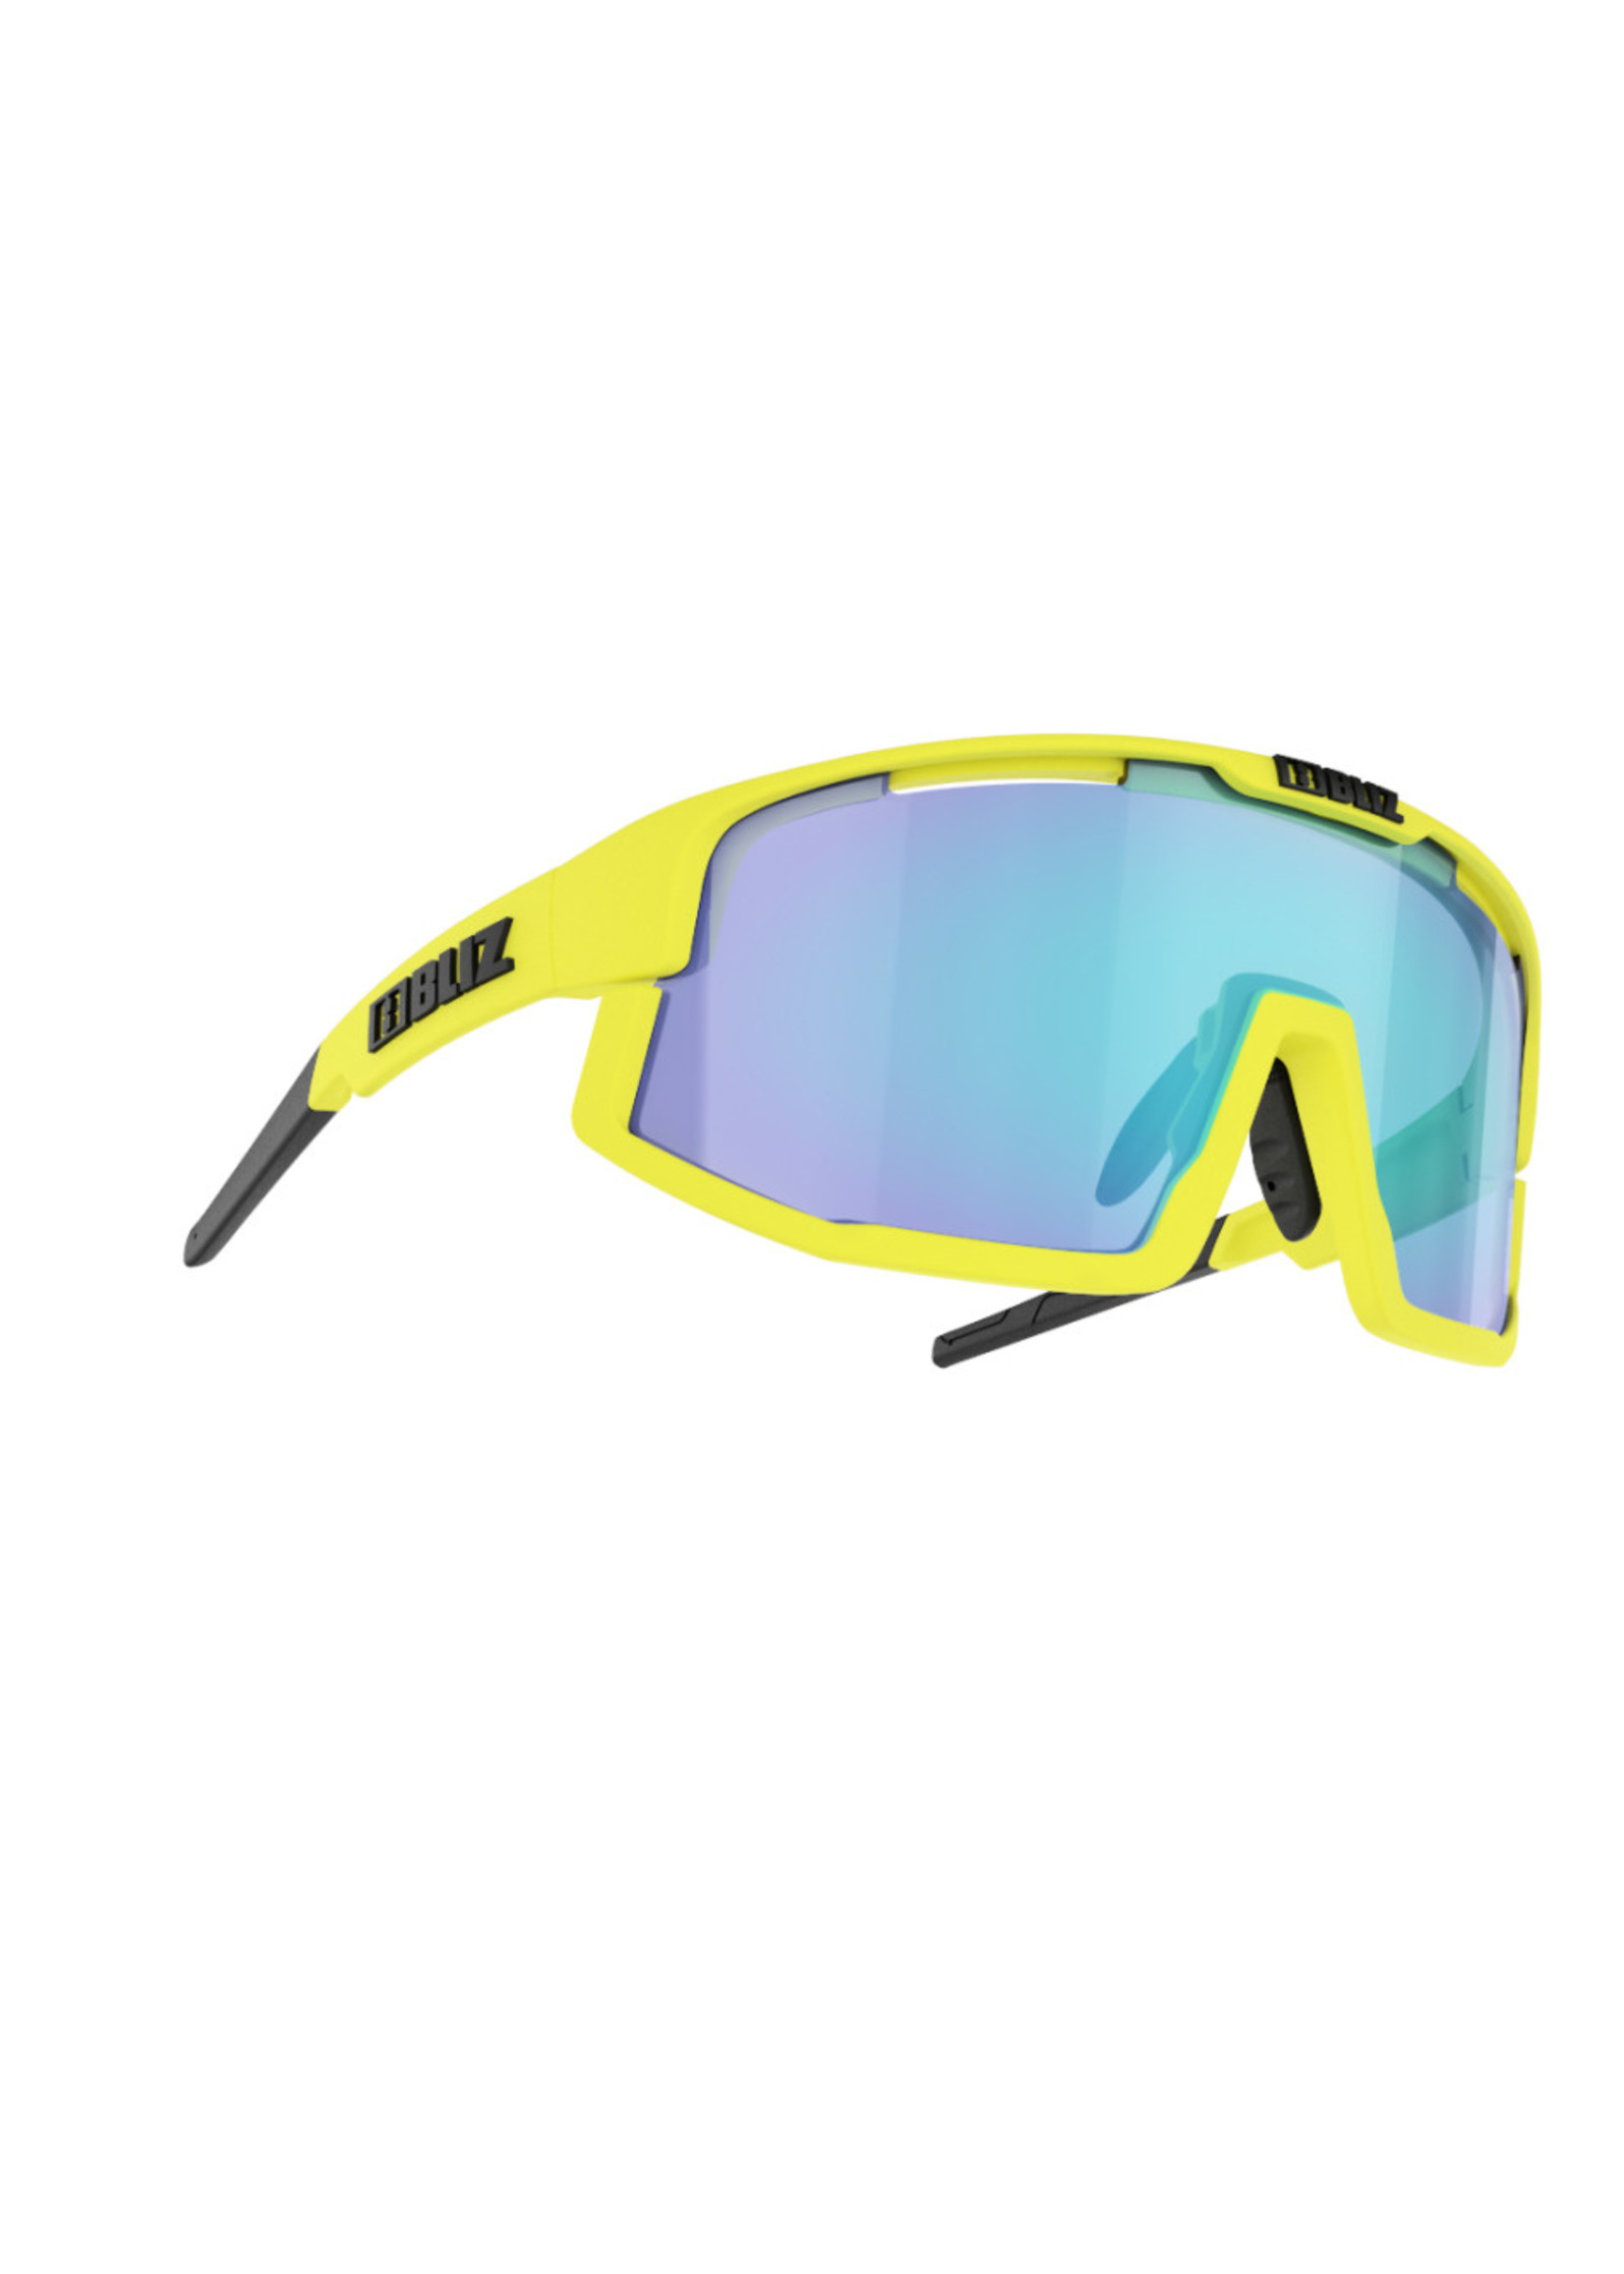 Bliz Eyewear Bliz Vision lunettes